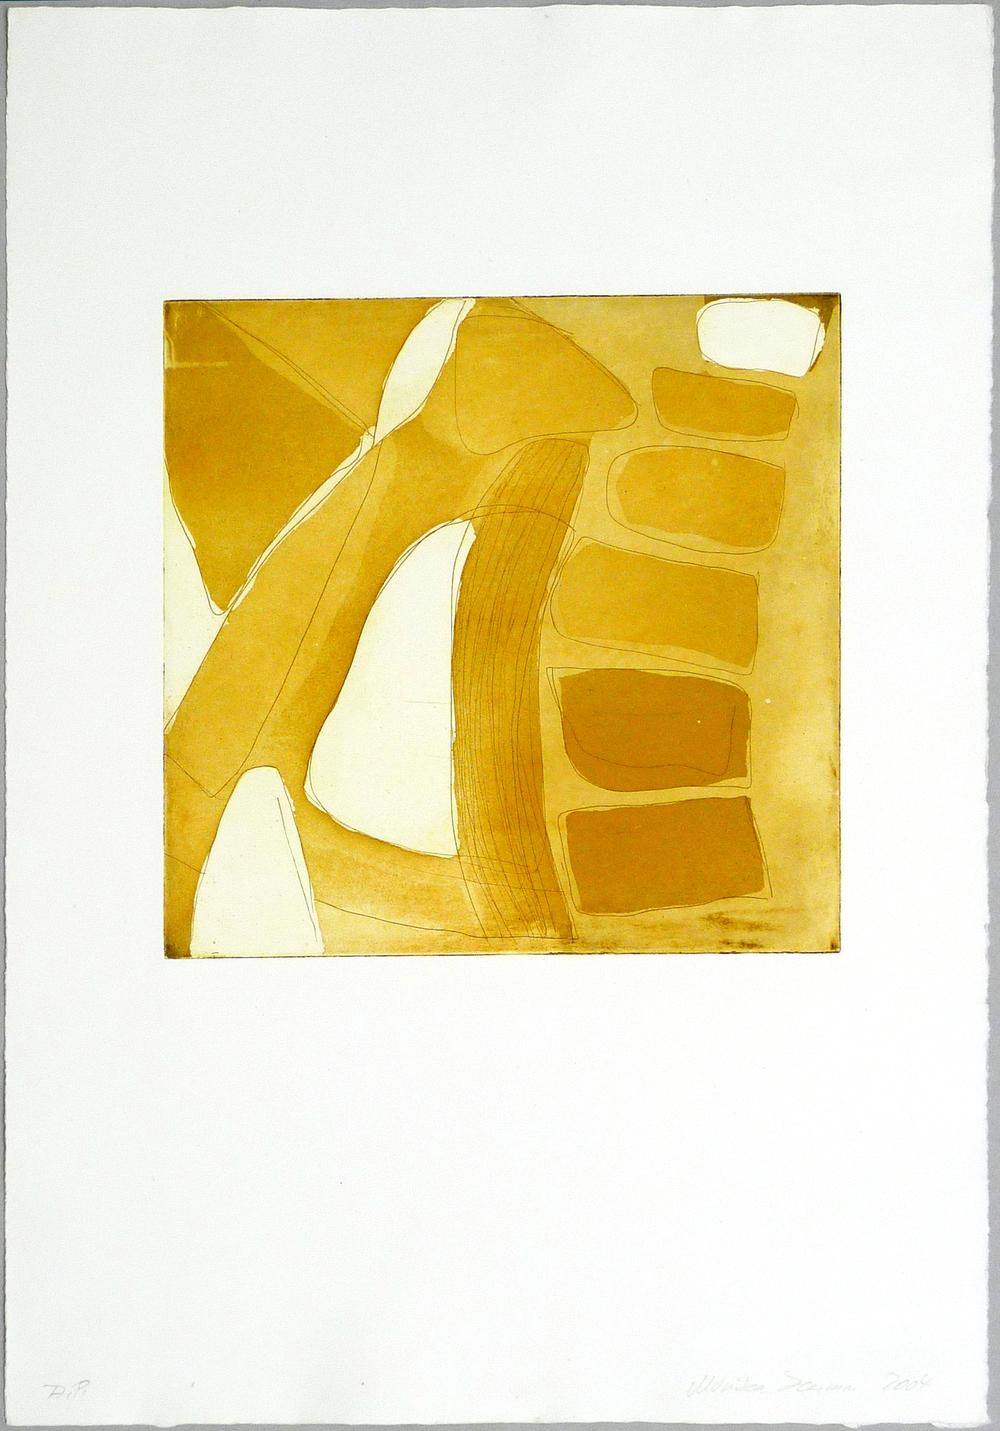 Humm_Aquatinta_3_yellow_ochre_1_PG26,5x27_Bütten57x39 Kopie.jpg